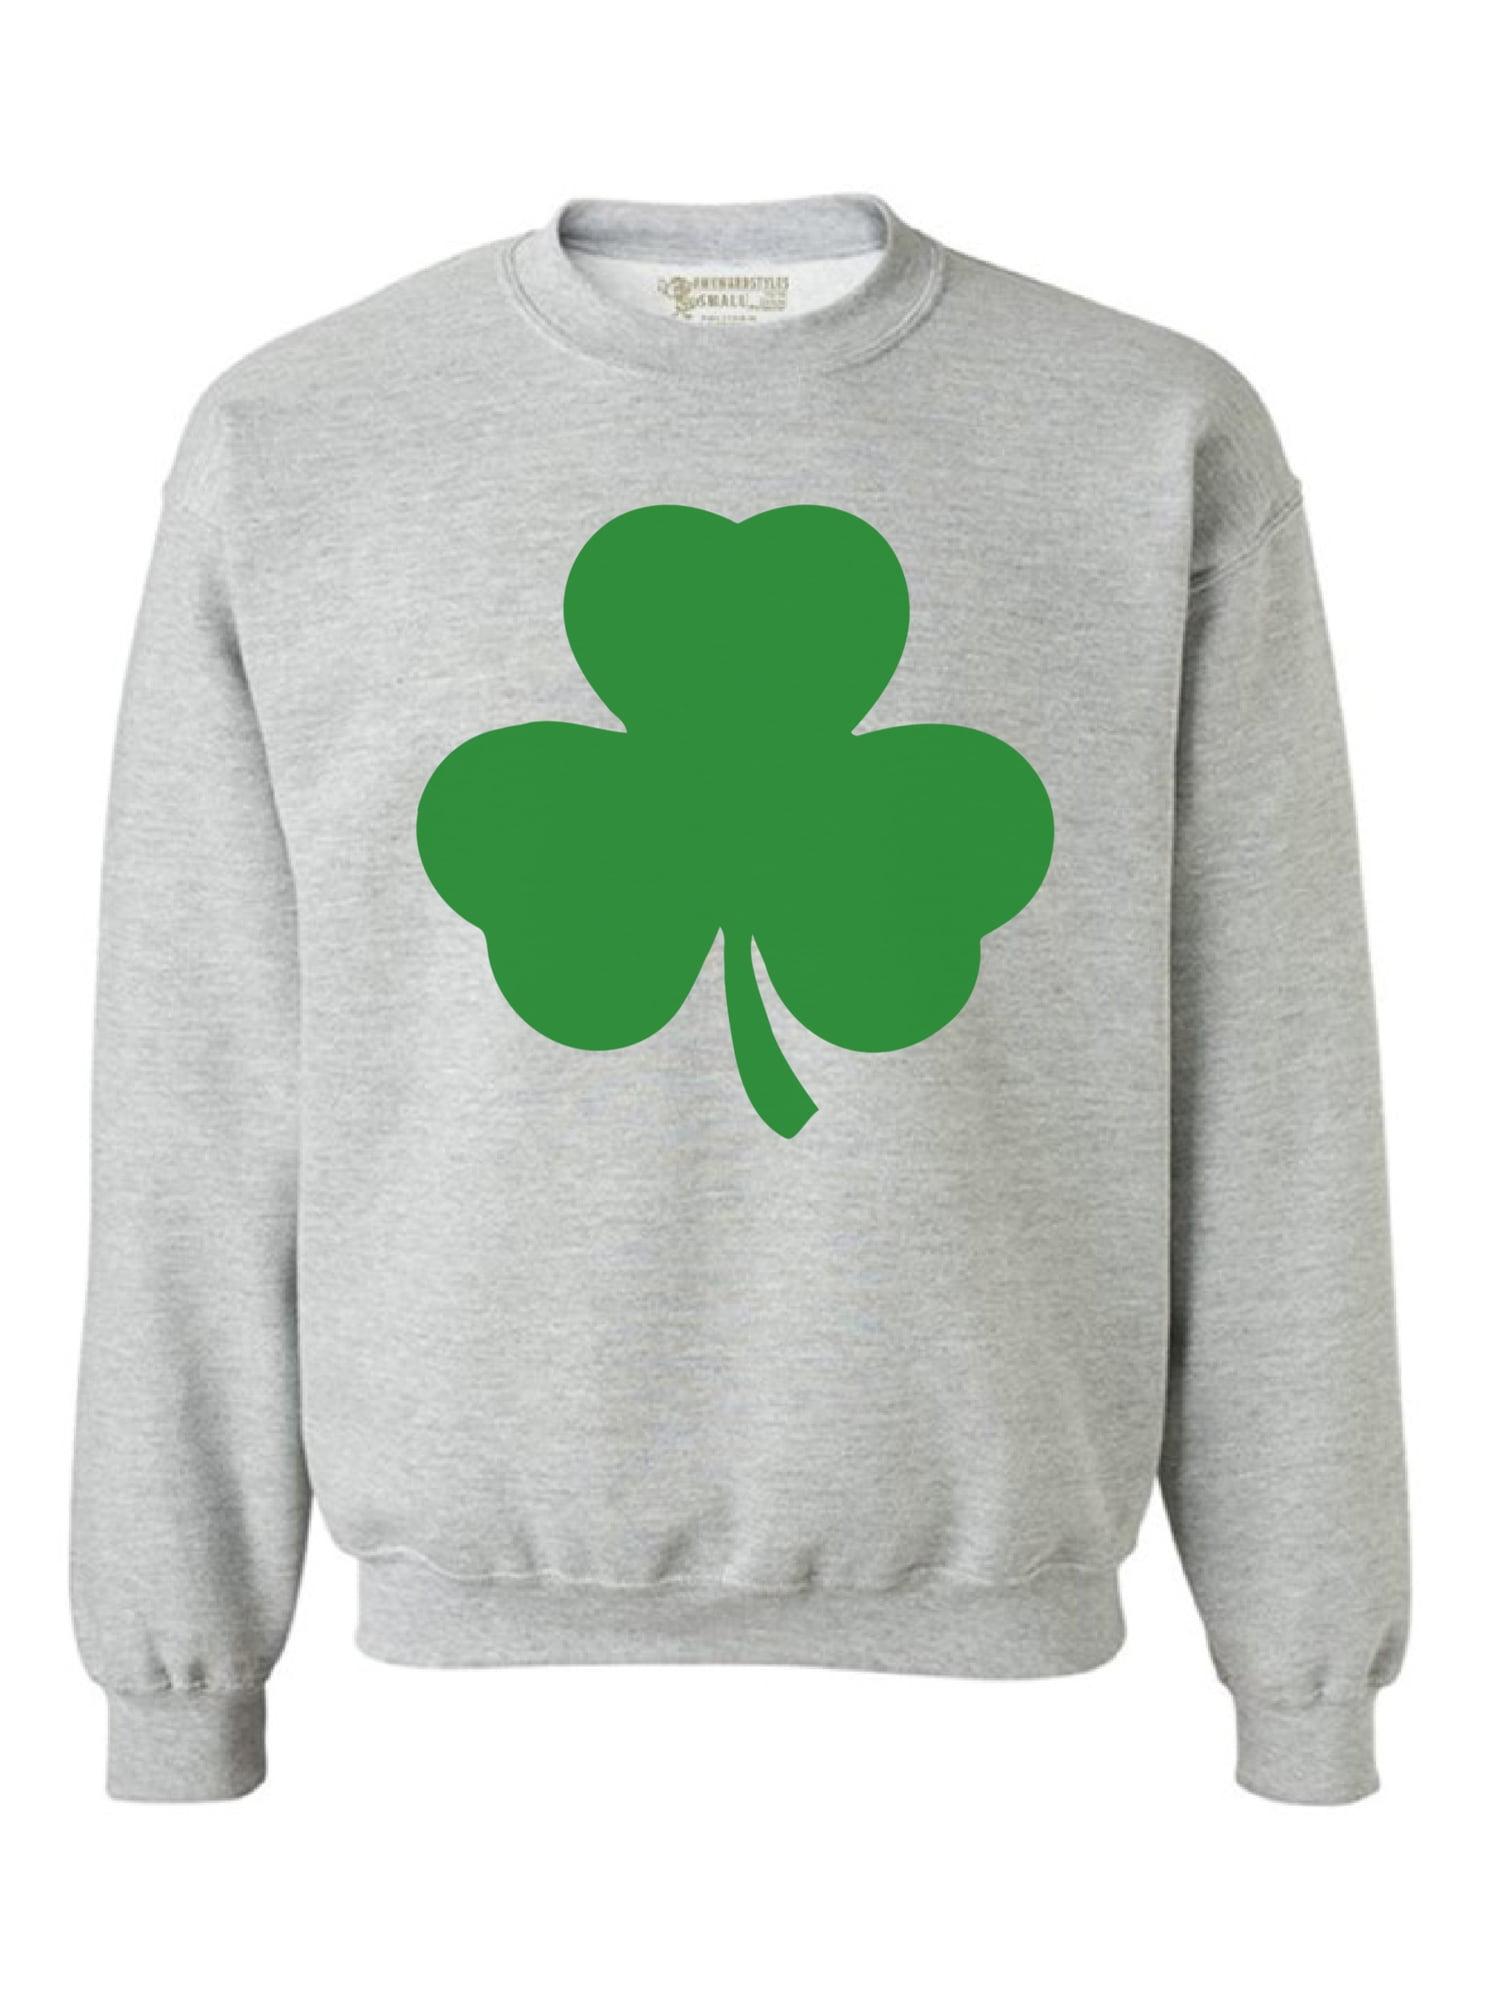 Patricks Day Awkward Styles Shamrock Pocket Size Sweatshirt Lucky Sweater St